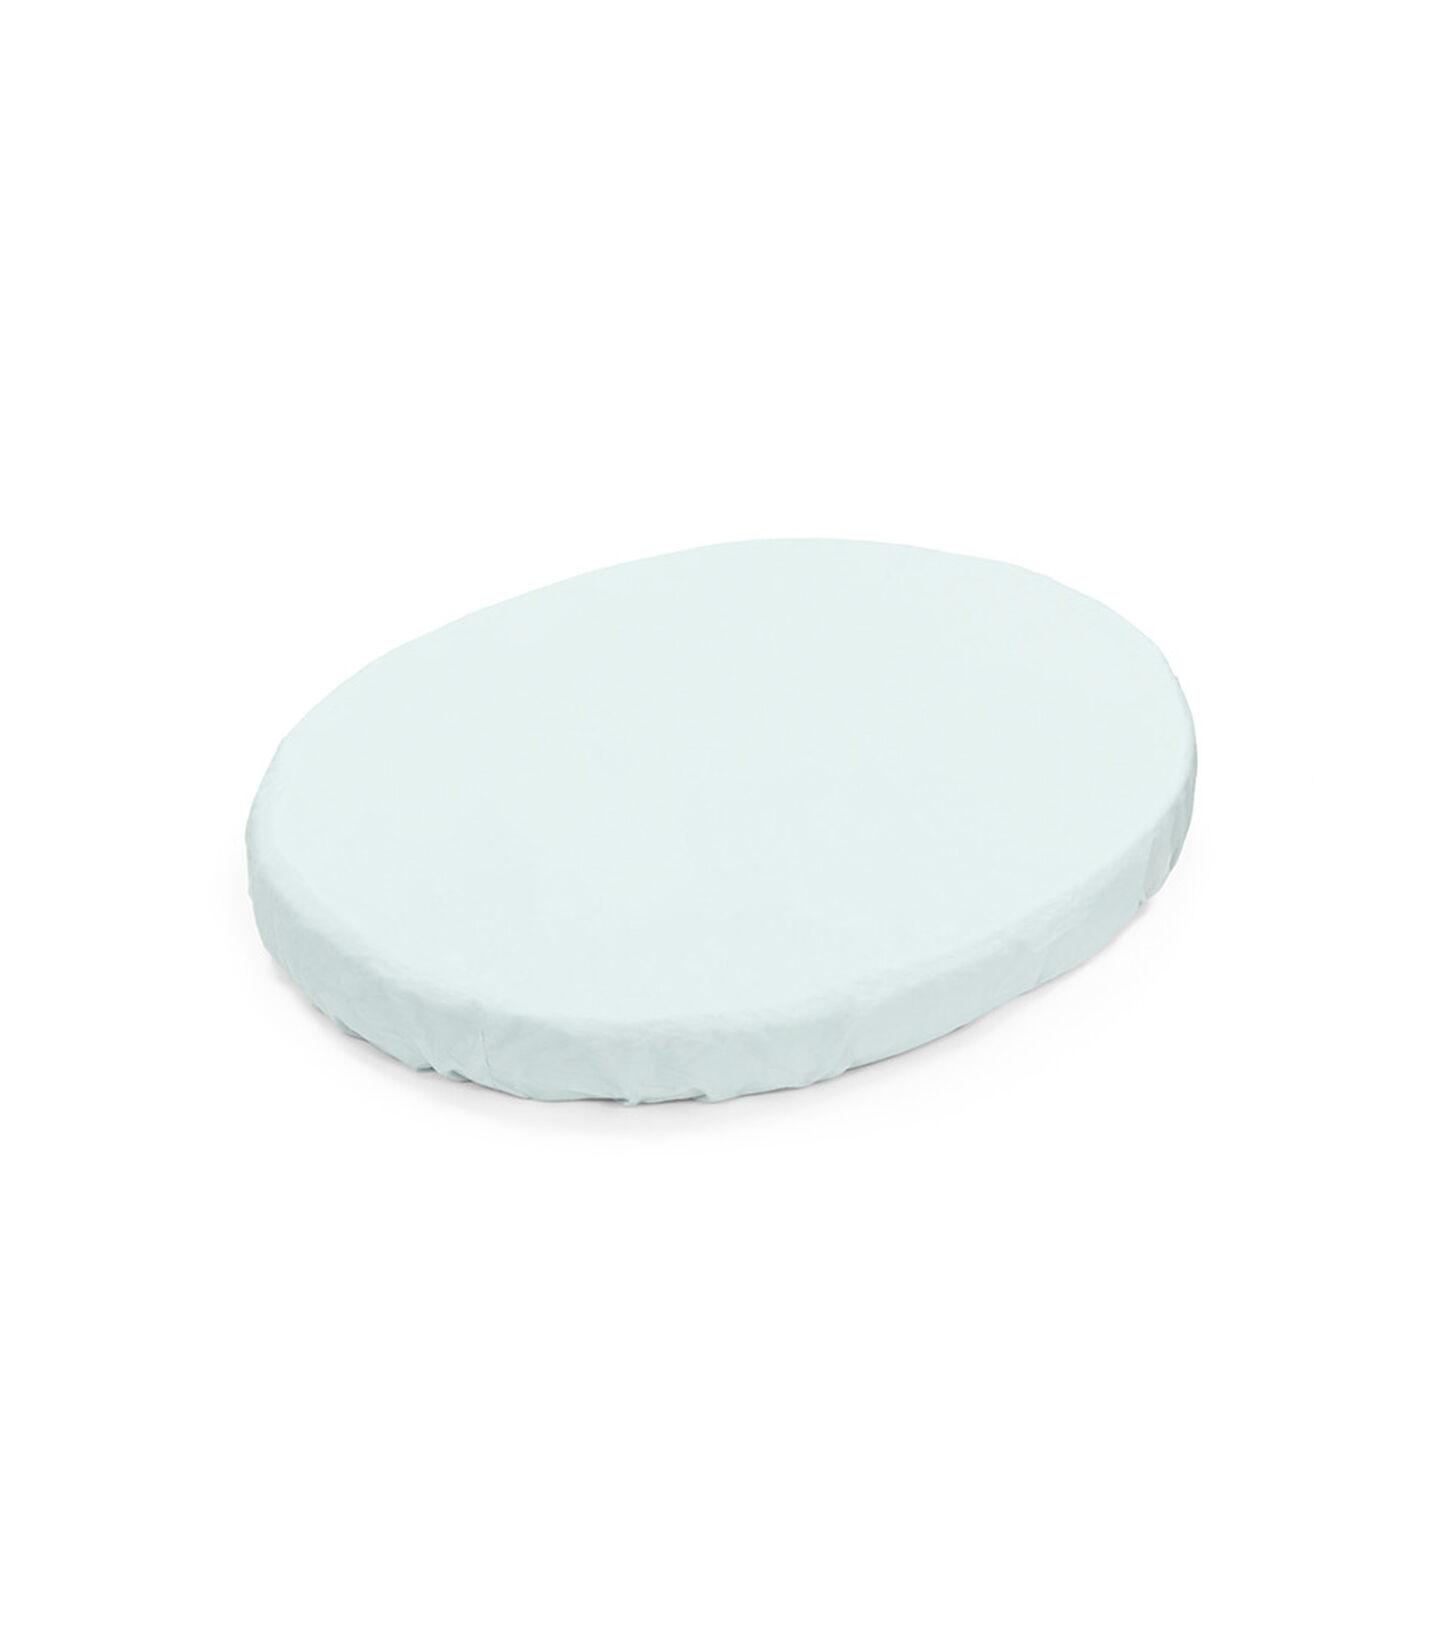 Stokke® Sleepi™ Mini Formsydd laken i Powder Blue, Powder Blue, mainview view 2